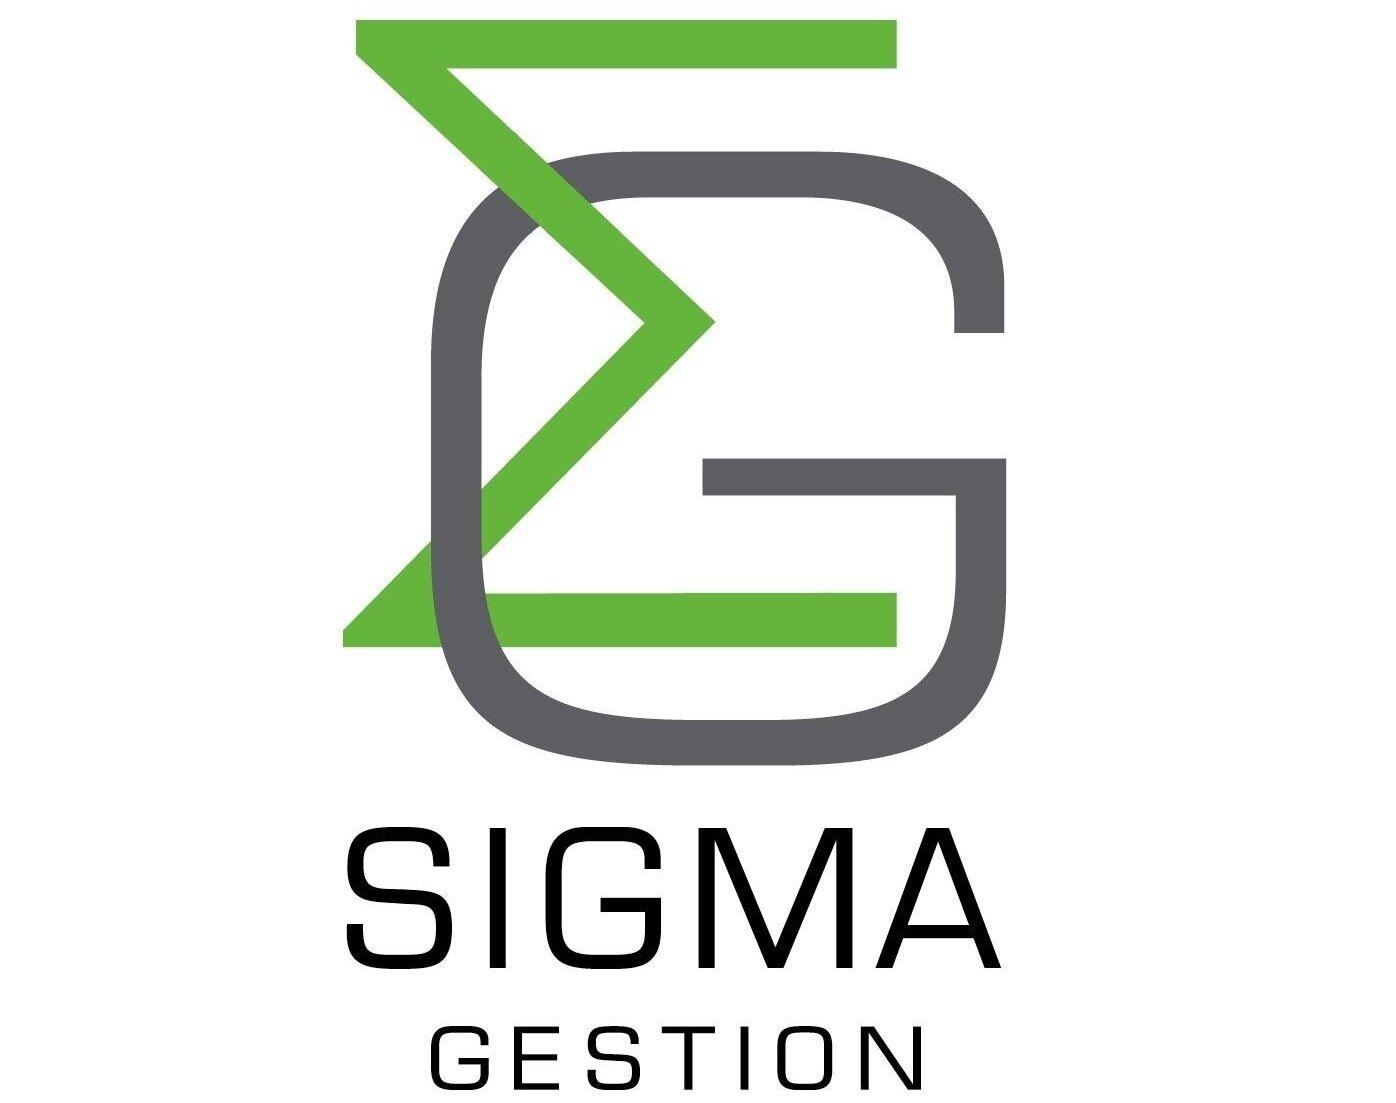 sigma+logo.jpg